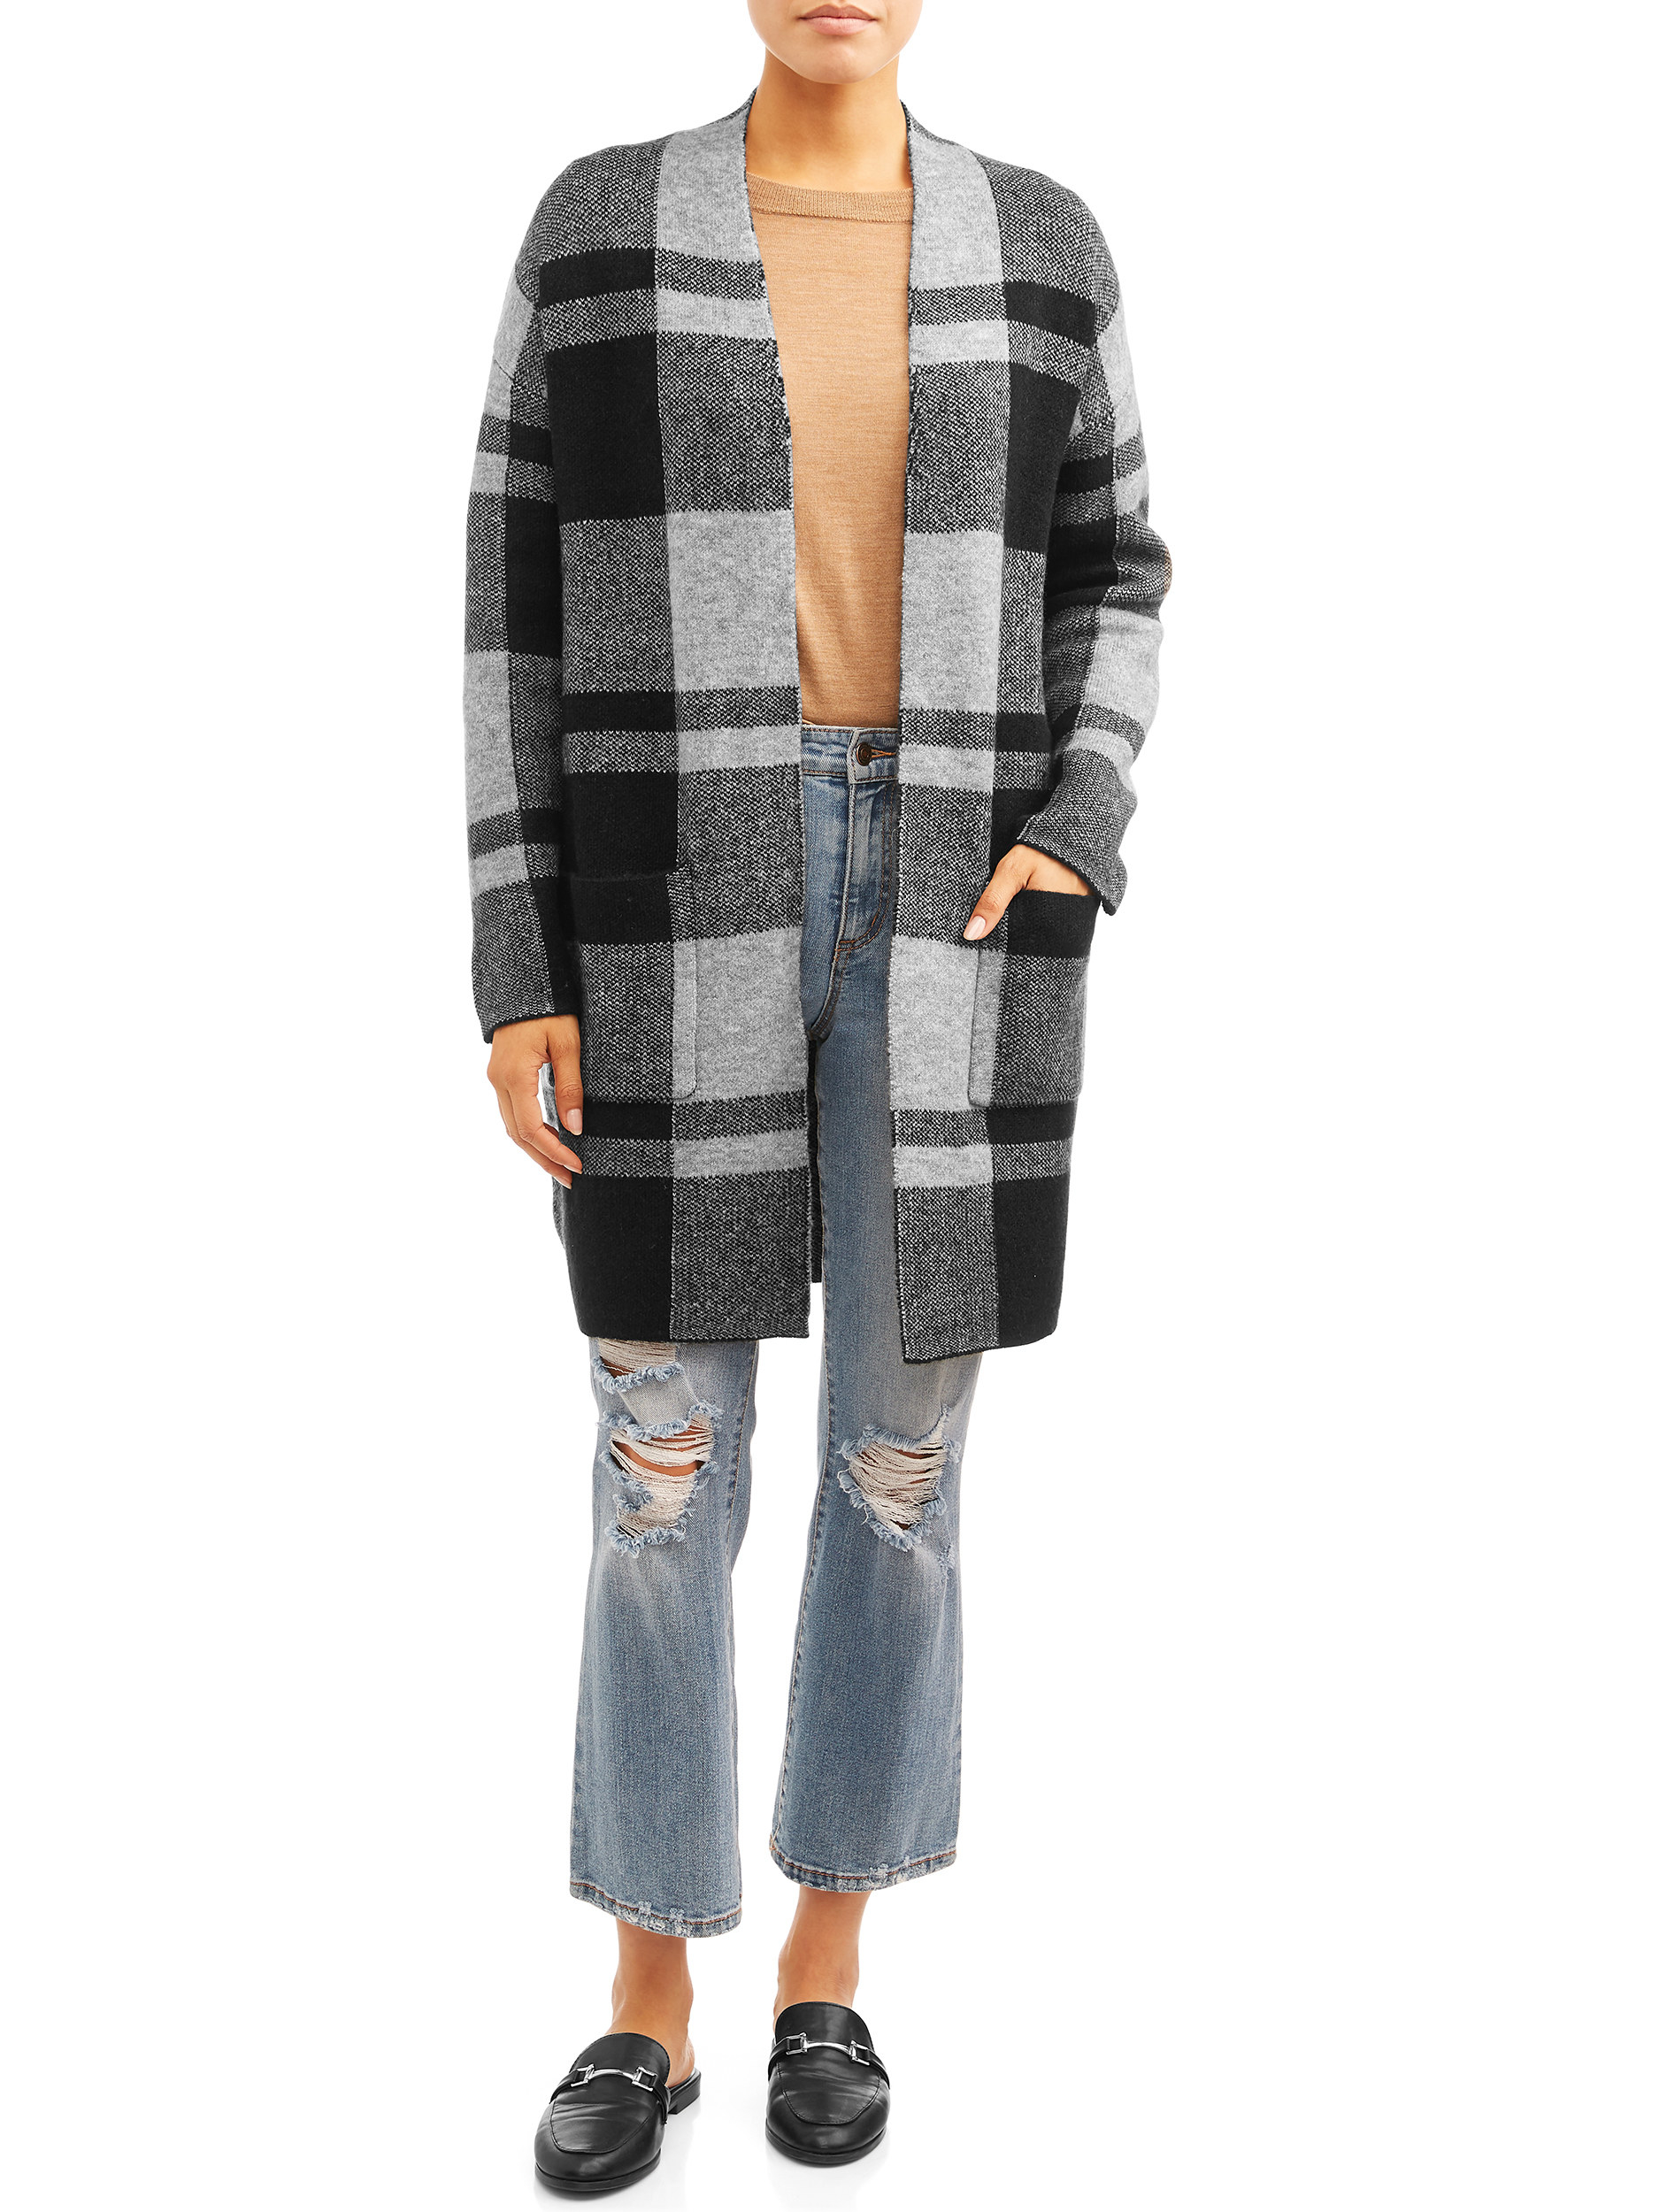 Model wears the plaid cardigan